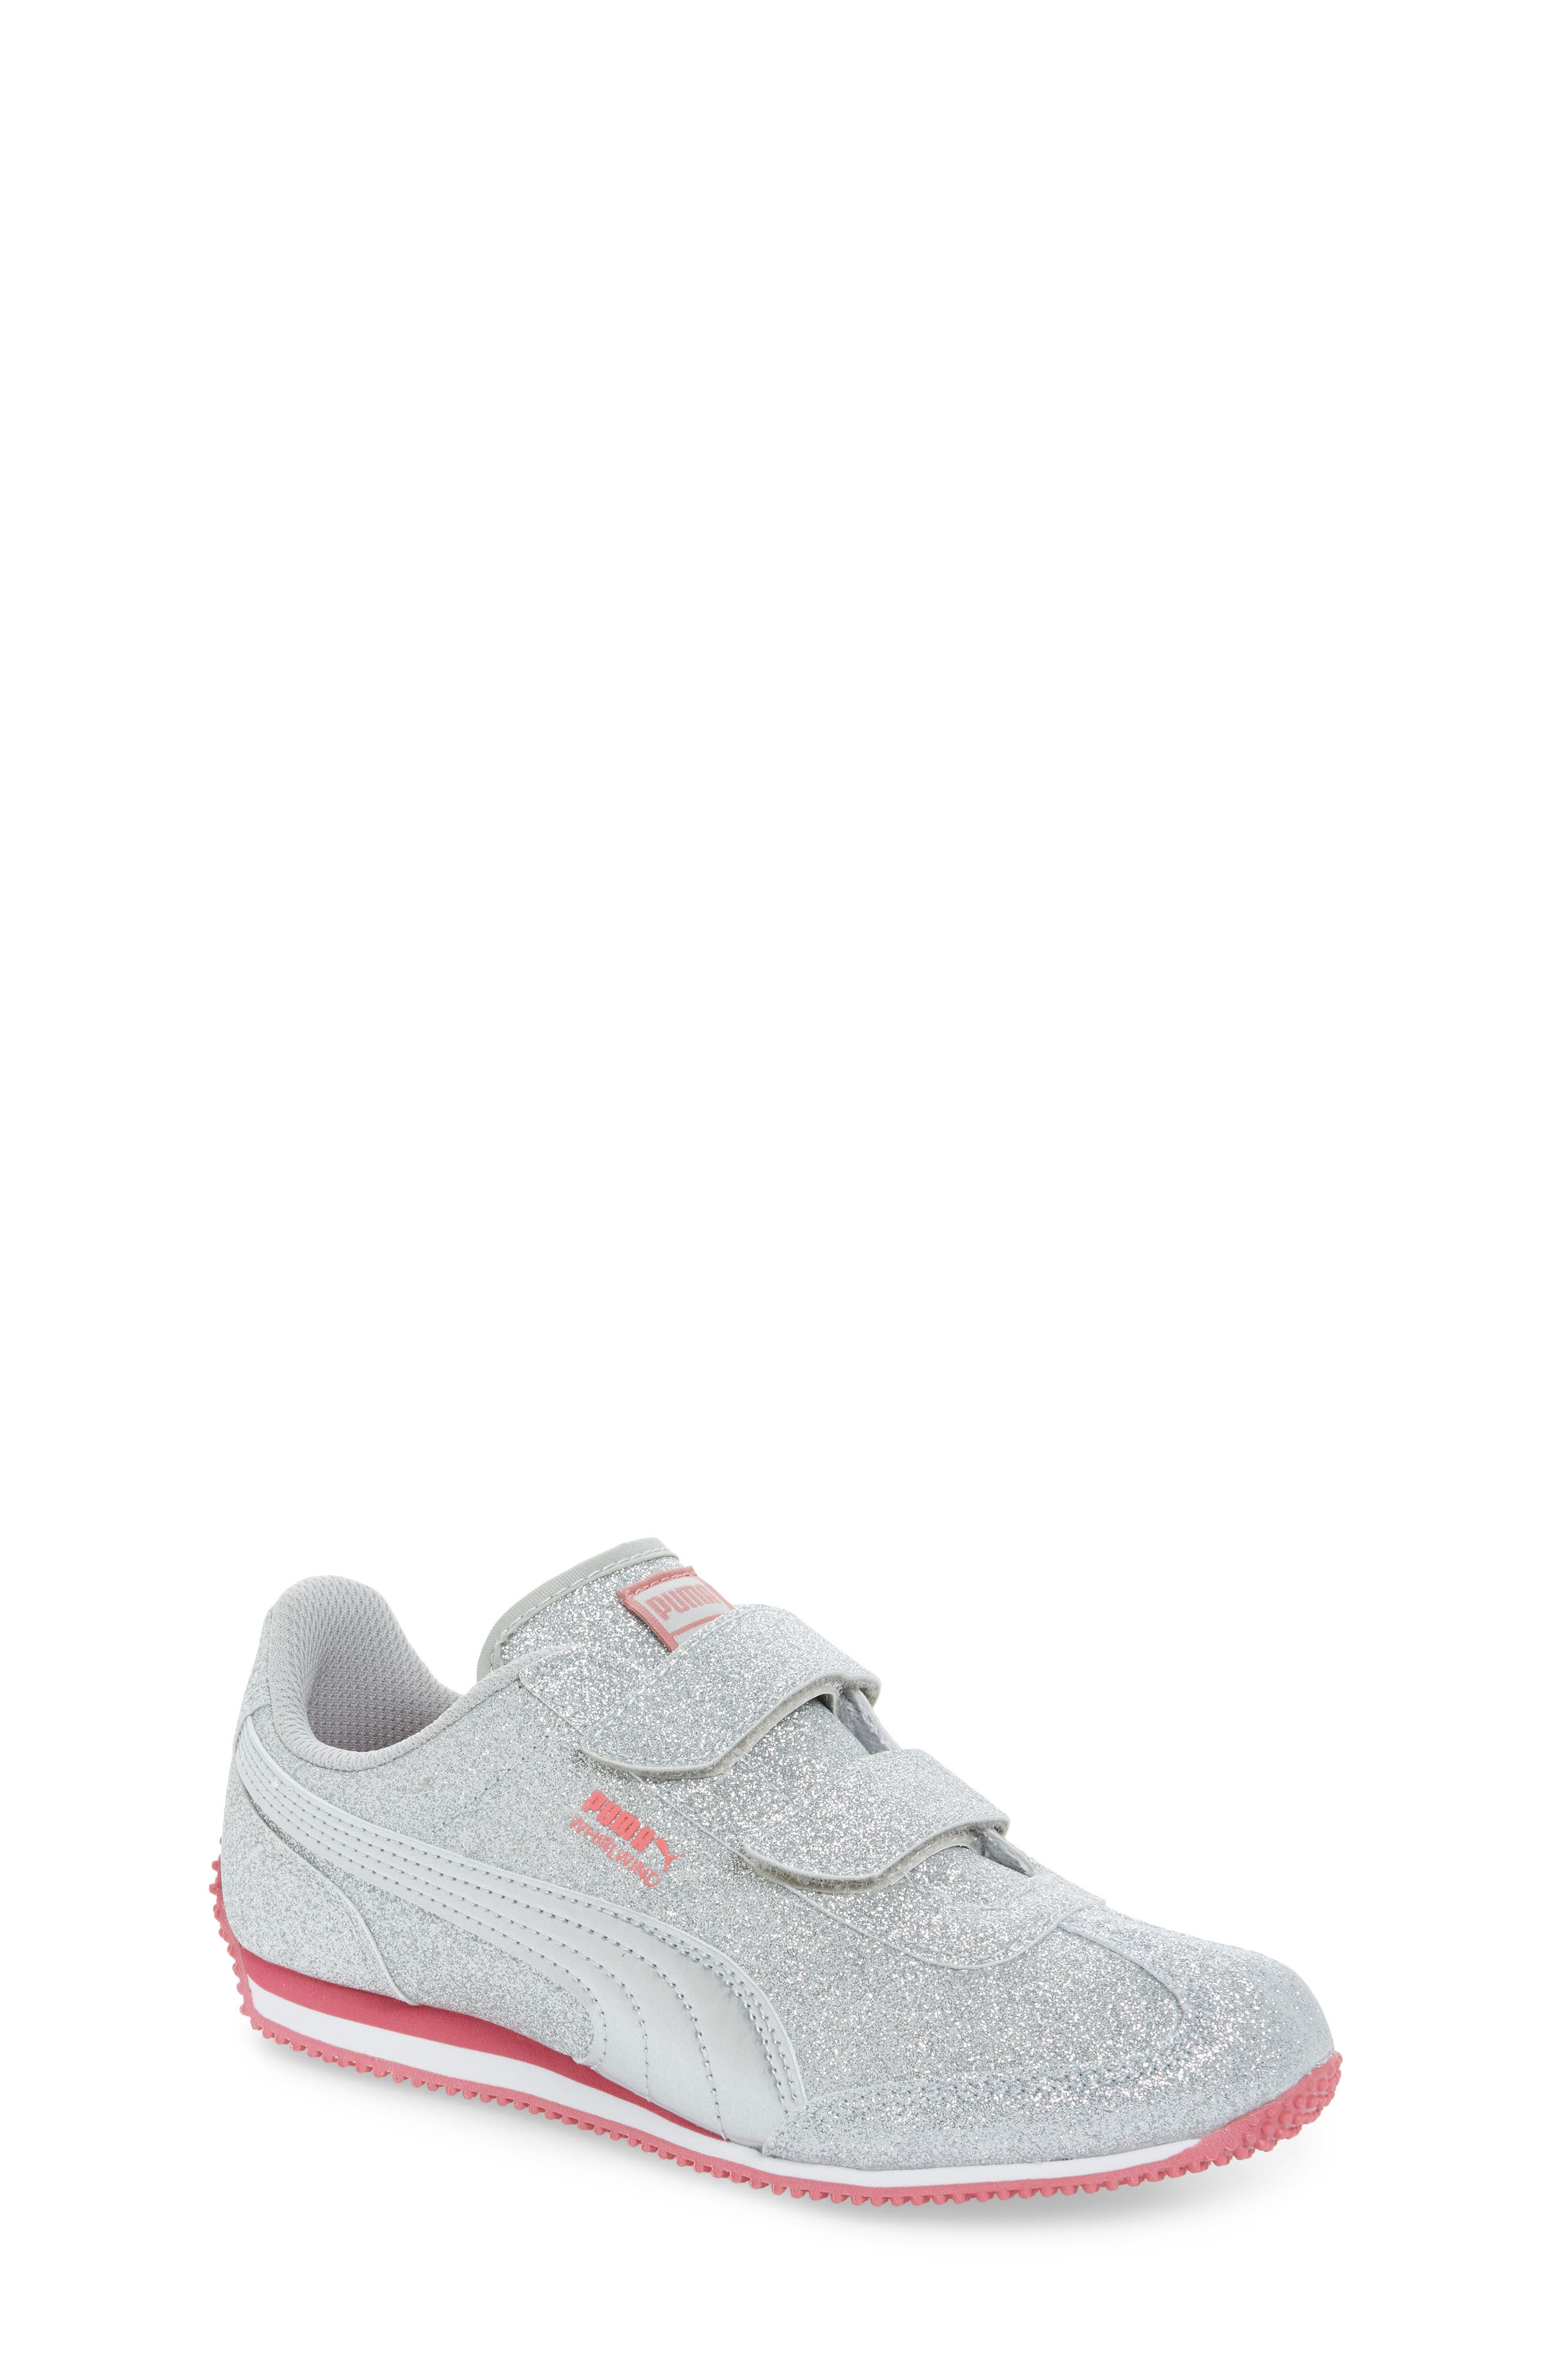 Alternate Image 1 Selected - PUMA Whirlwind Glitz Sneaker (Toddler, Little Kid & Big Kid)